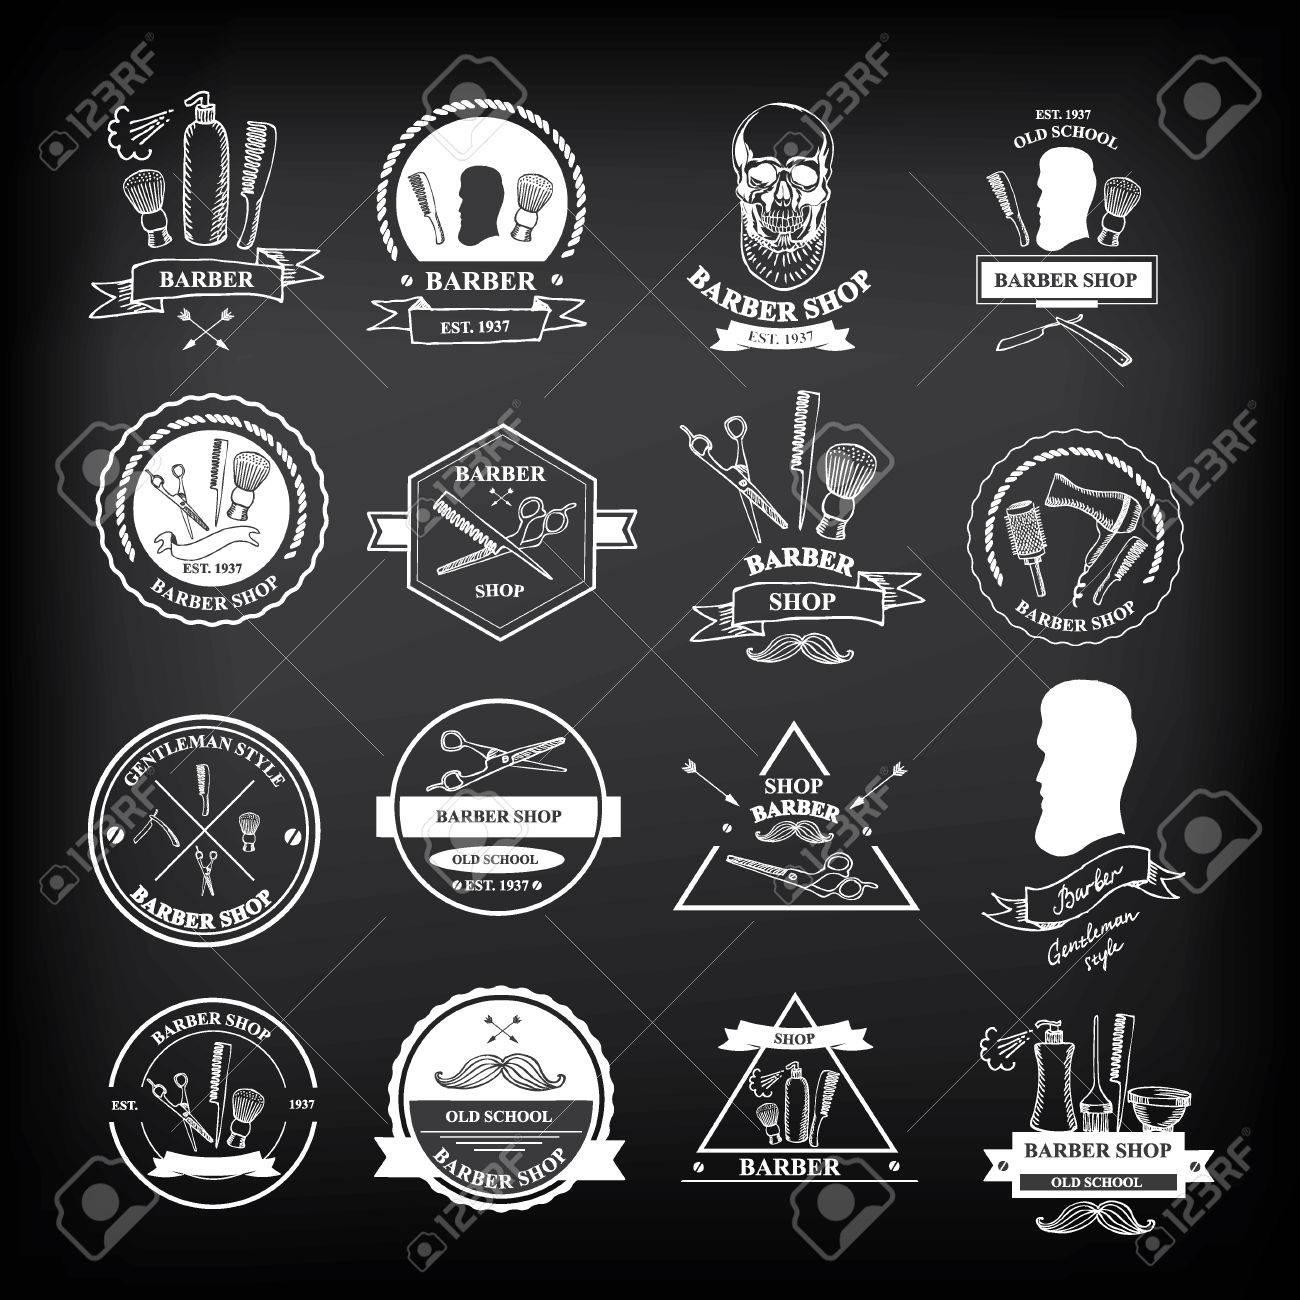 Barber shop labels,vector icons. - 34057971